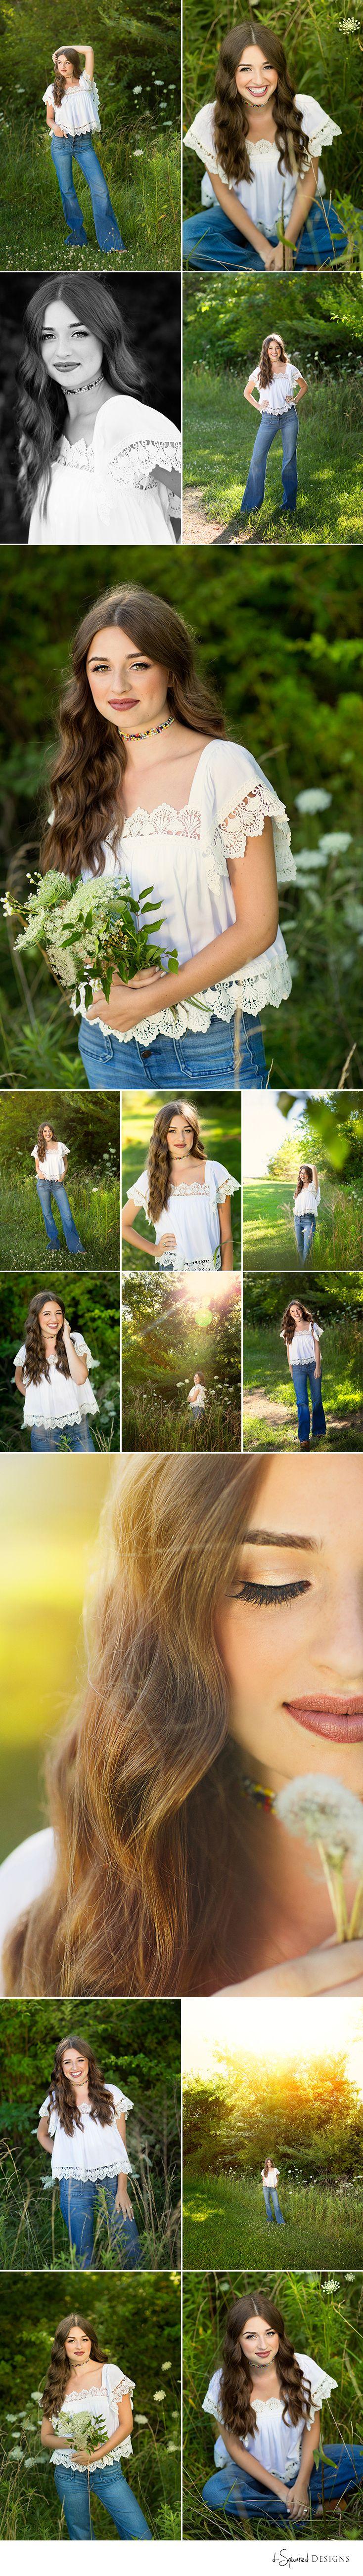 d-Squared Designs St. Louis, MO Senior Photography, Summer senior girl. Gorgeous senior. Summer senior outfit. Boho. Nature photoshoot. Girl pose ideas. Senior poses. Flowers.